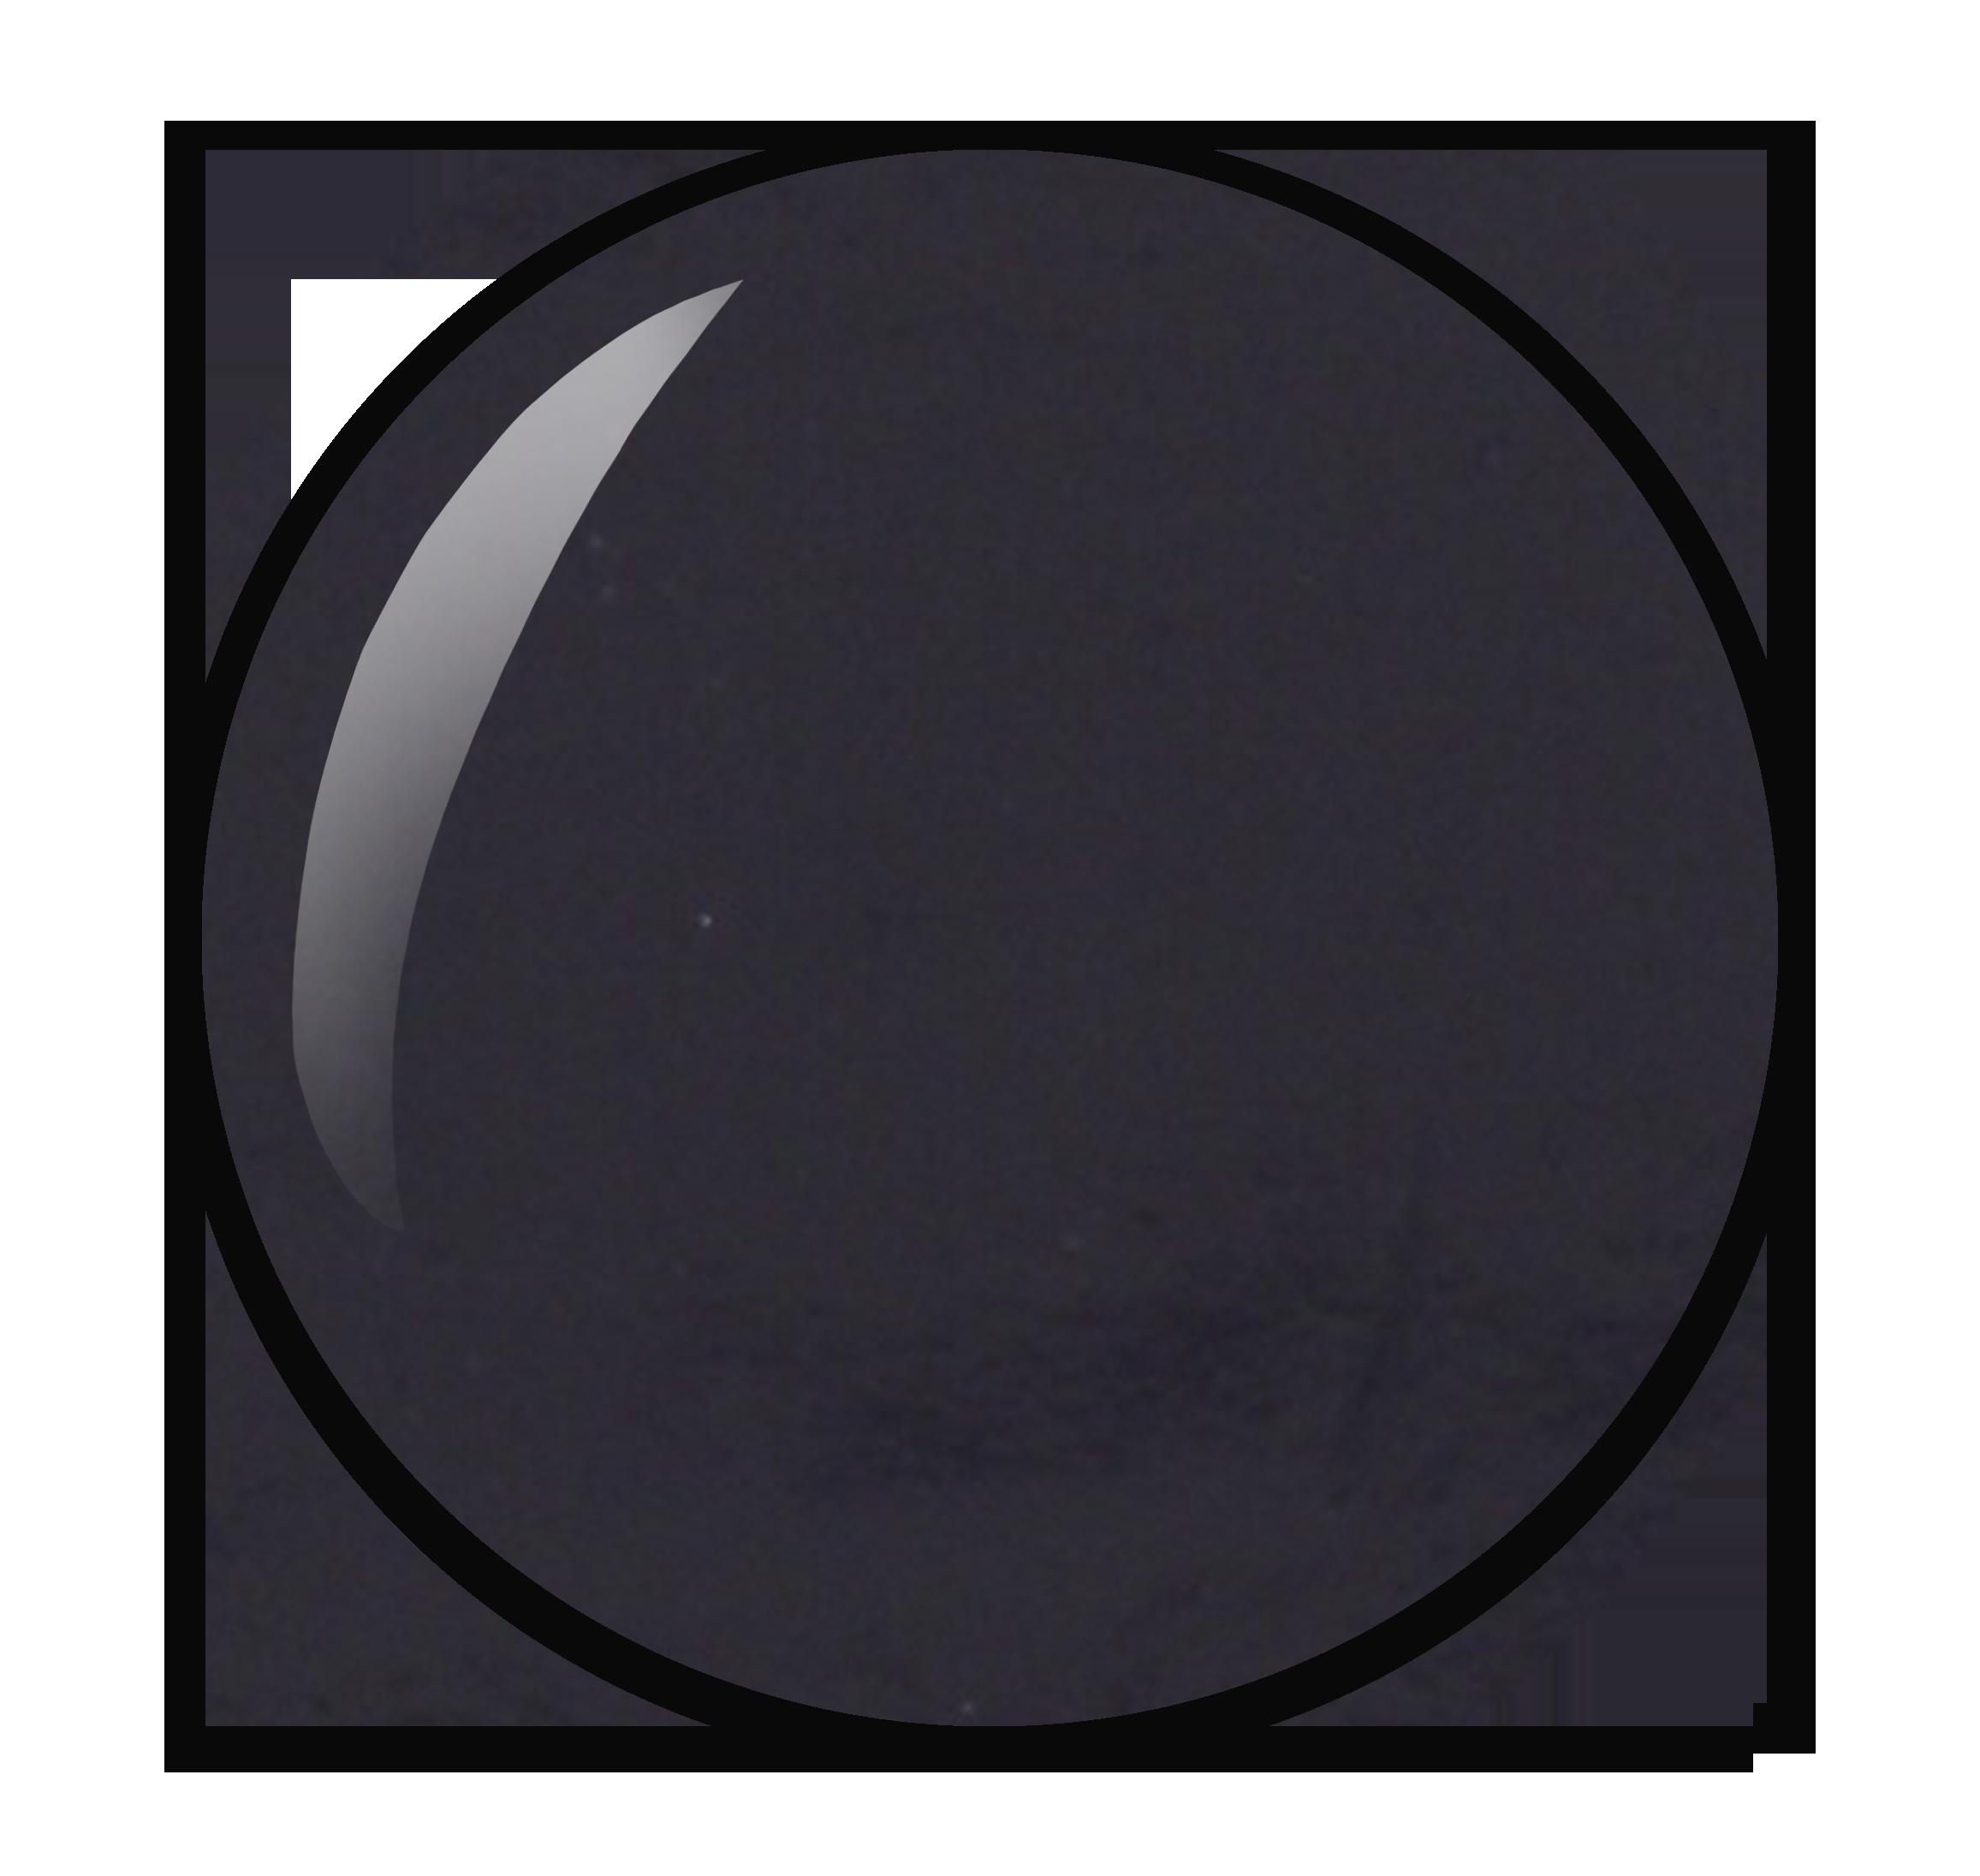 Donker paarse nagellak nummer 46 van Herôme nagellak collectie